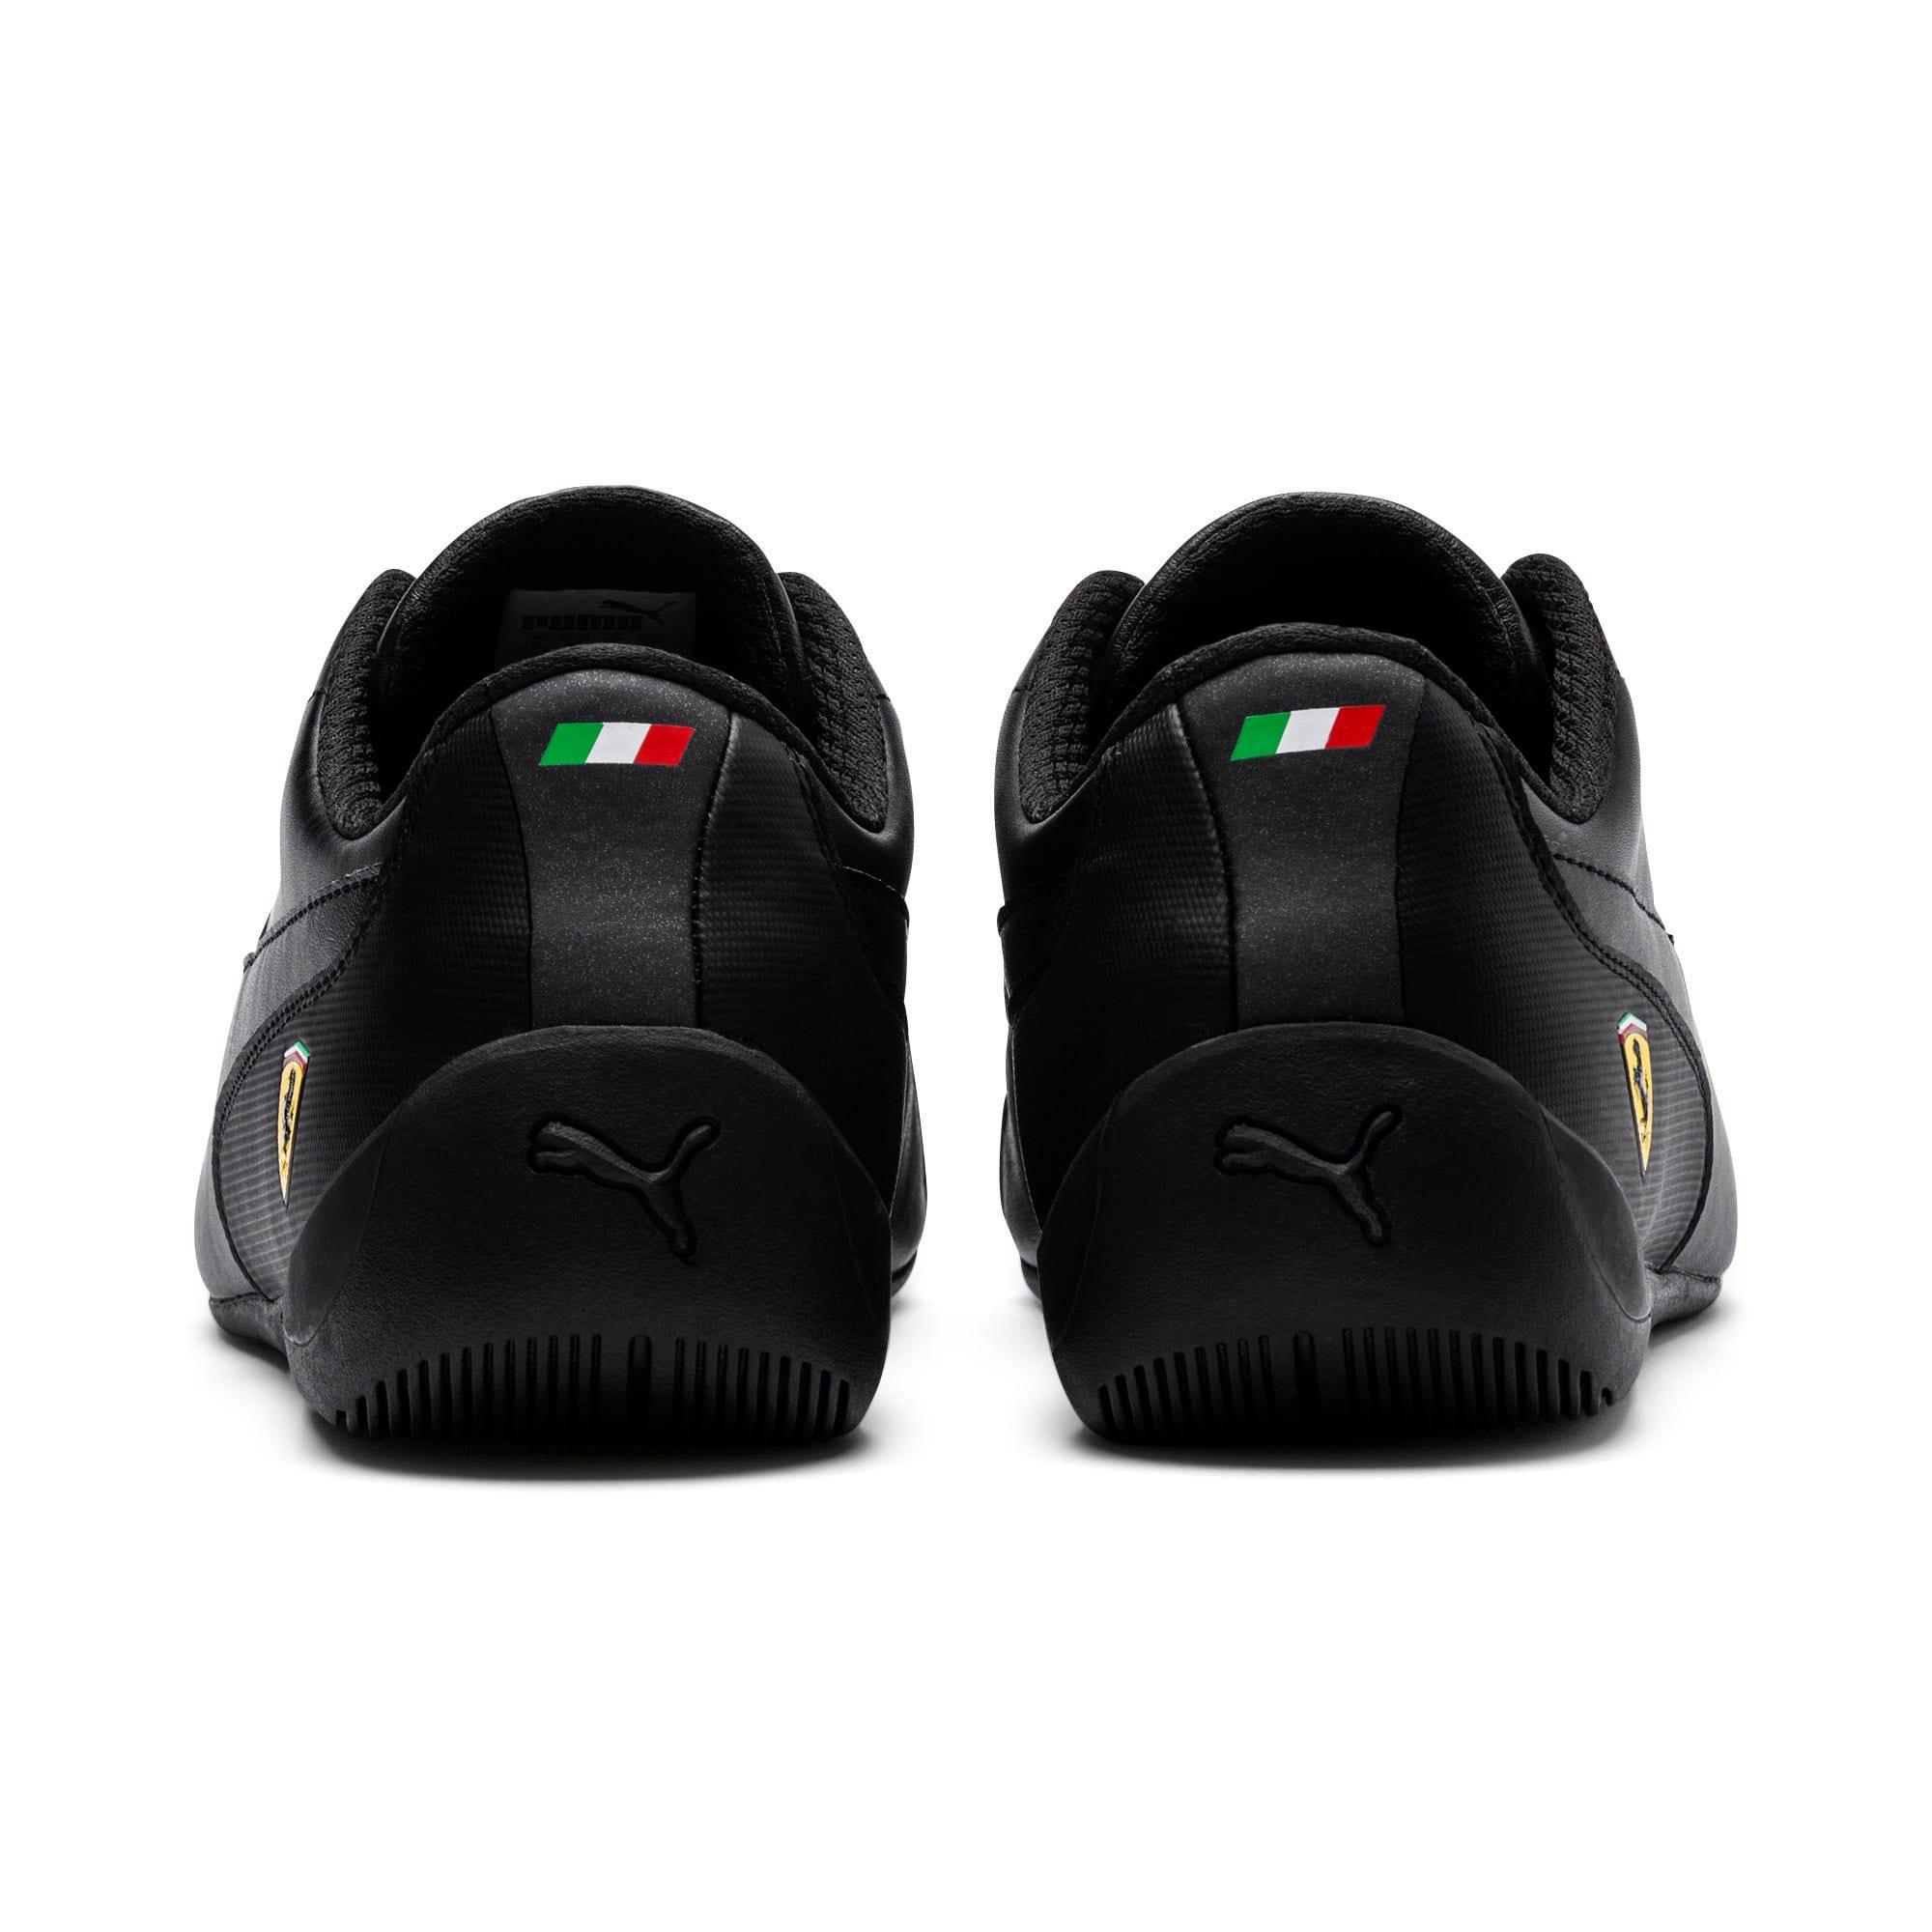 Thumbnail 4 of Ferrari Drift Cat 7 Trainers, Puma Black-Puma Black, medium-IND